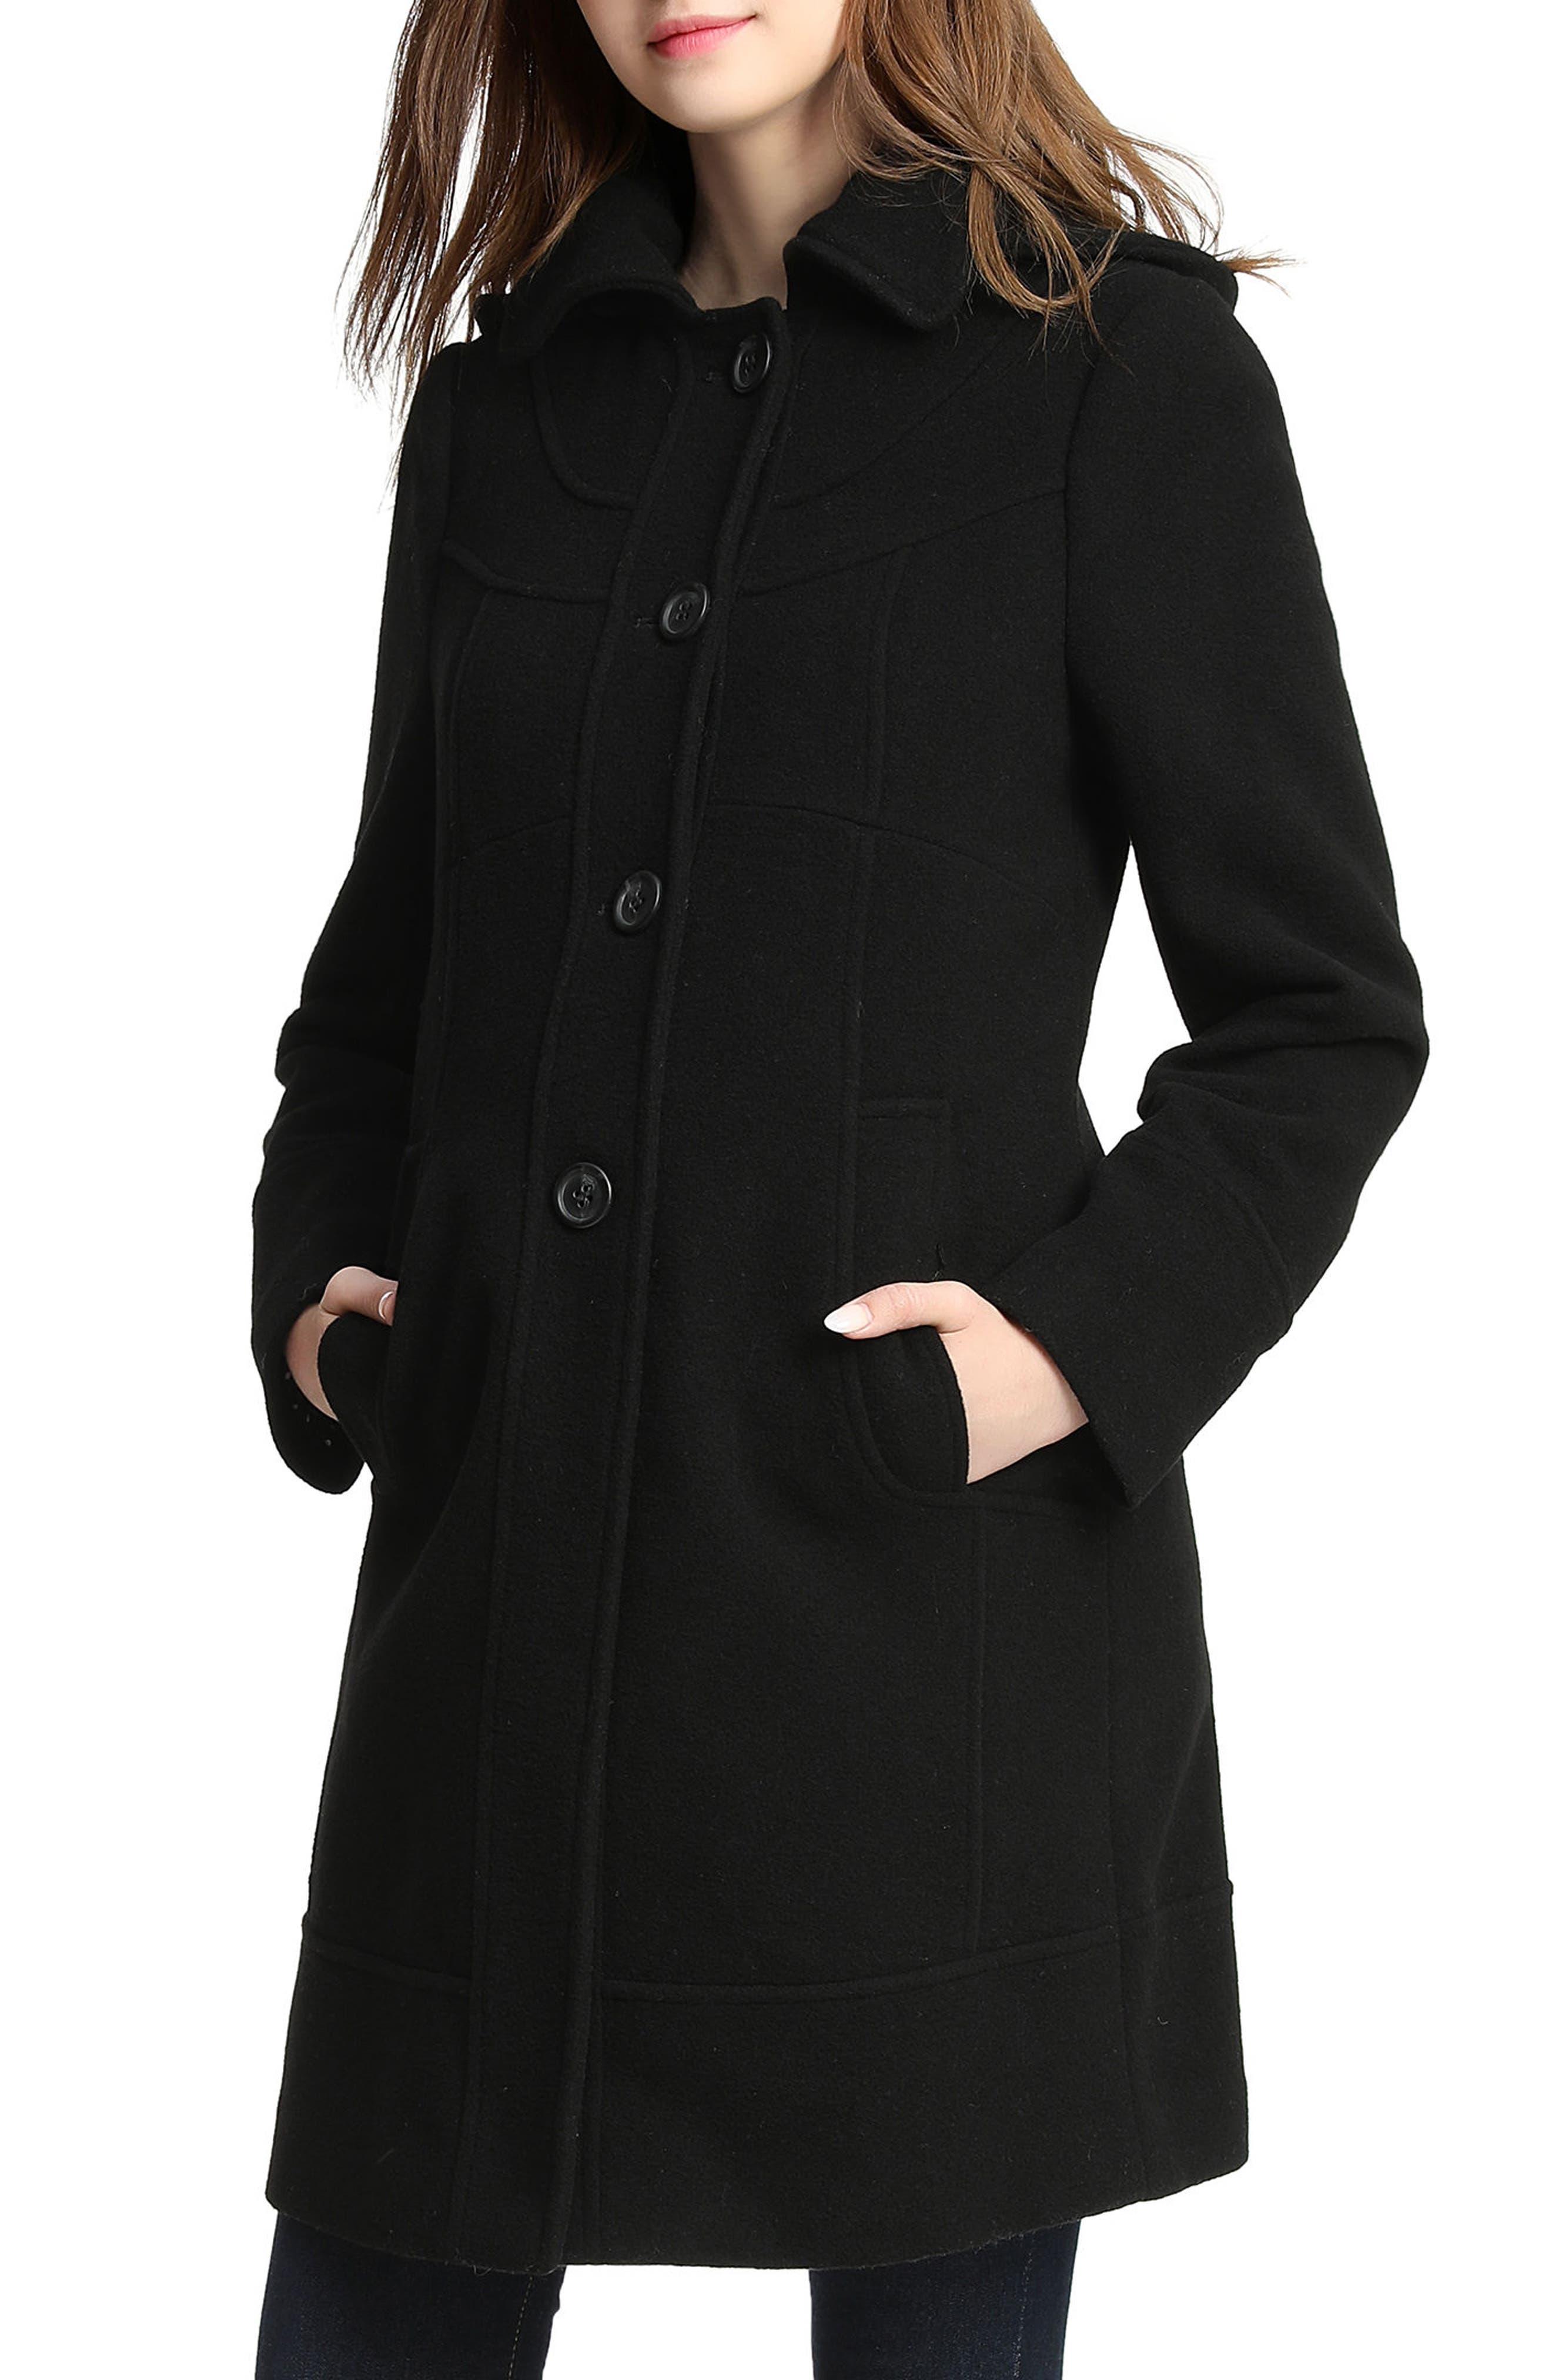 Wool Blend Maternity Coat,                             Main thumbnail 1, color,                             BLACK